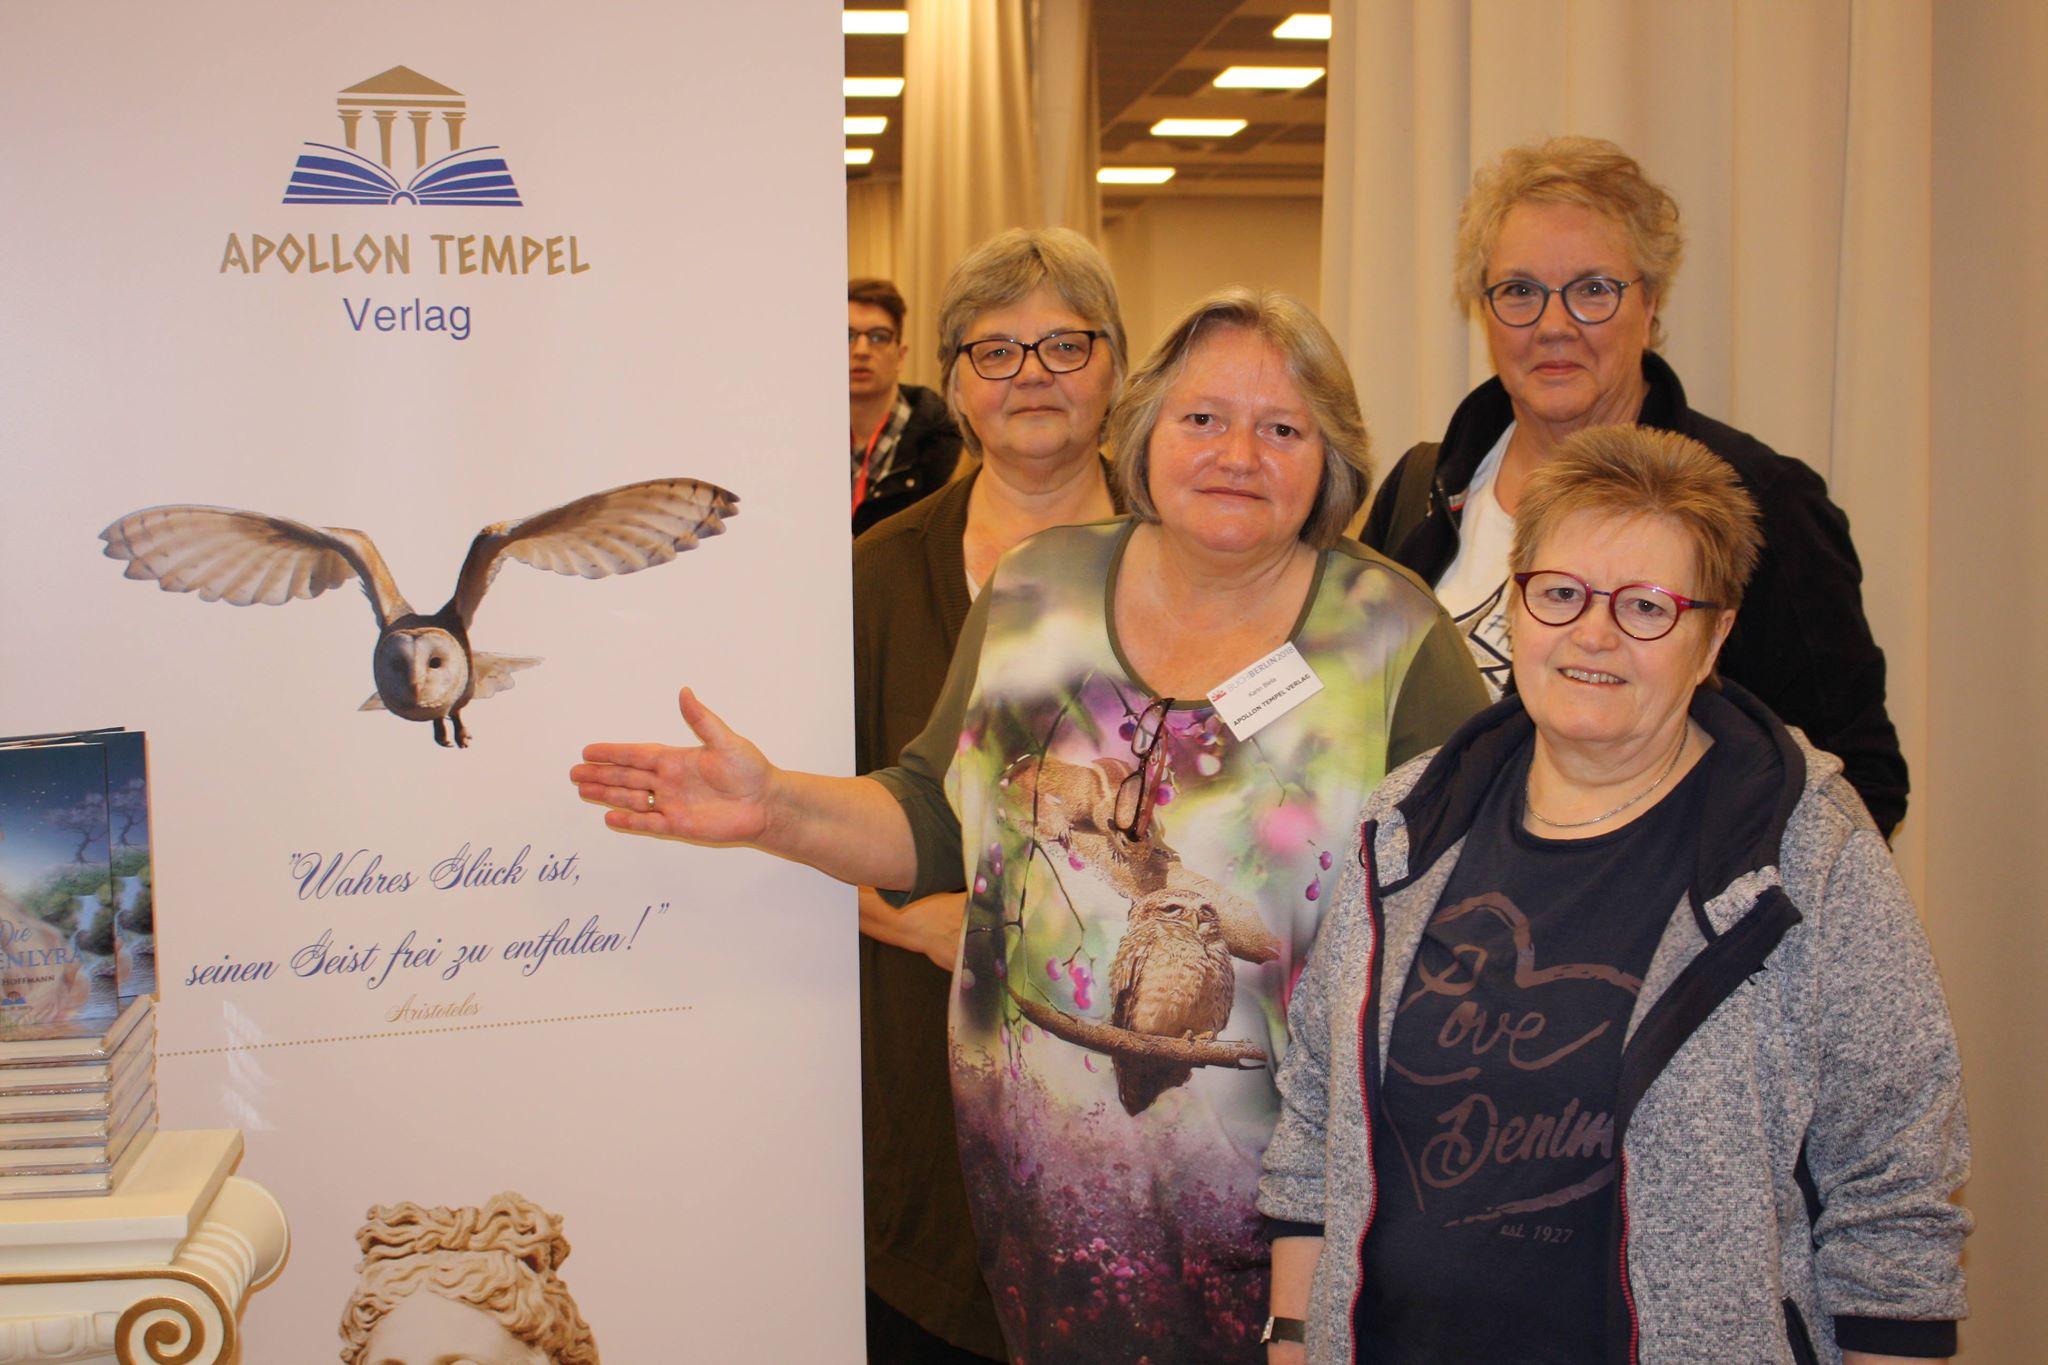 Buchmesse BuchBerlin 2018, Apollon Tempel Verlag